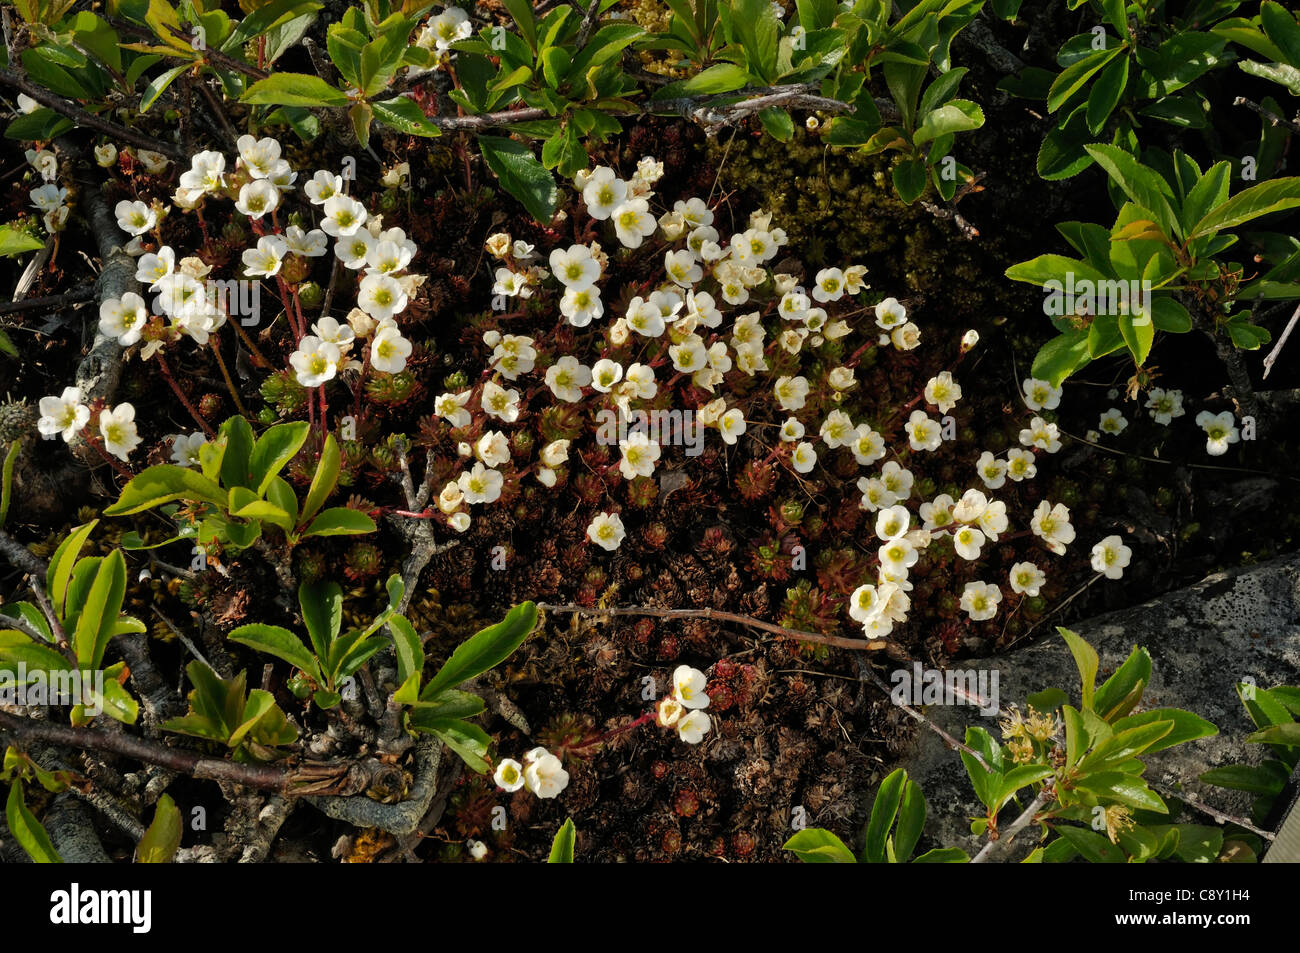 Irish Saxifrage - Saxifraga rosacea Stock Photo